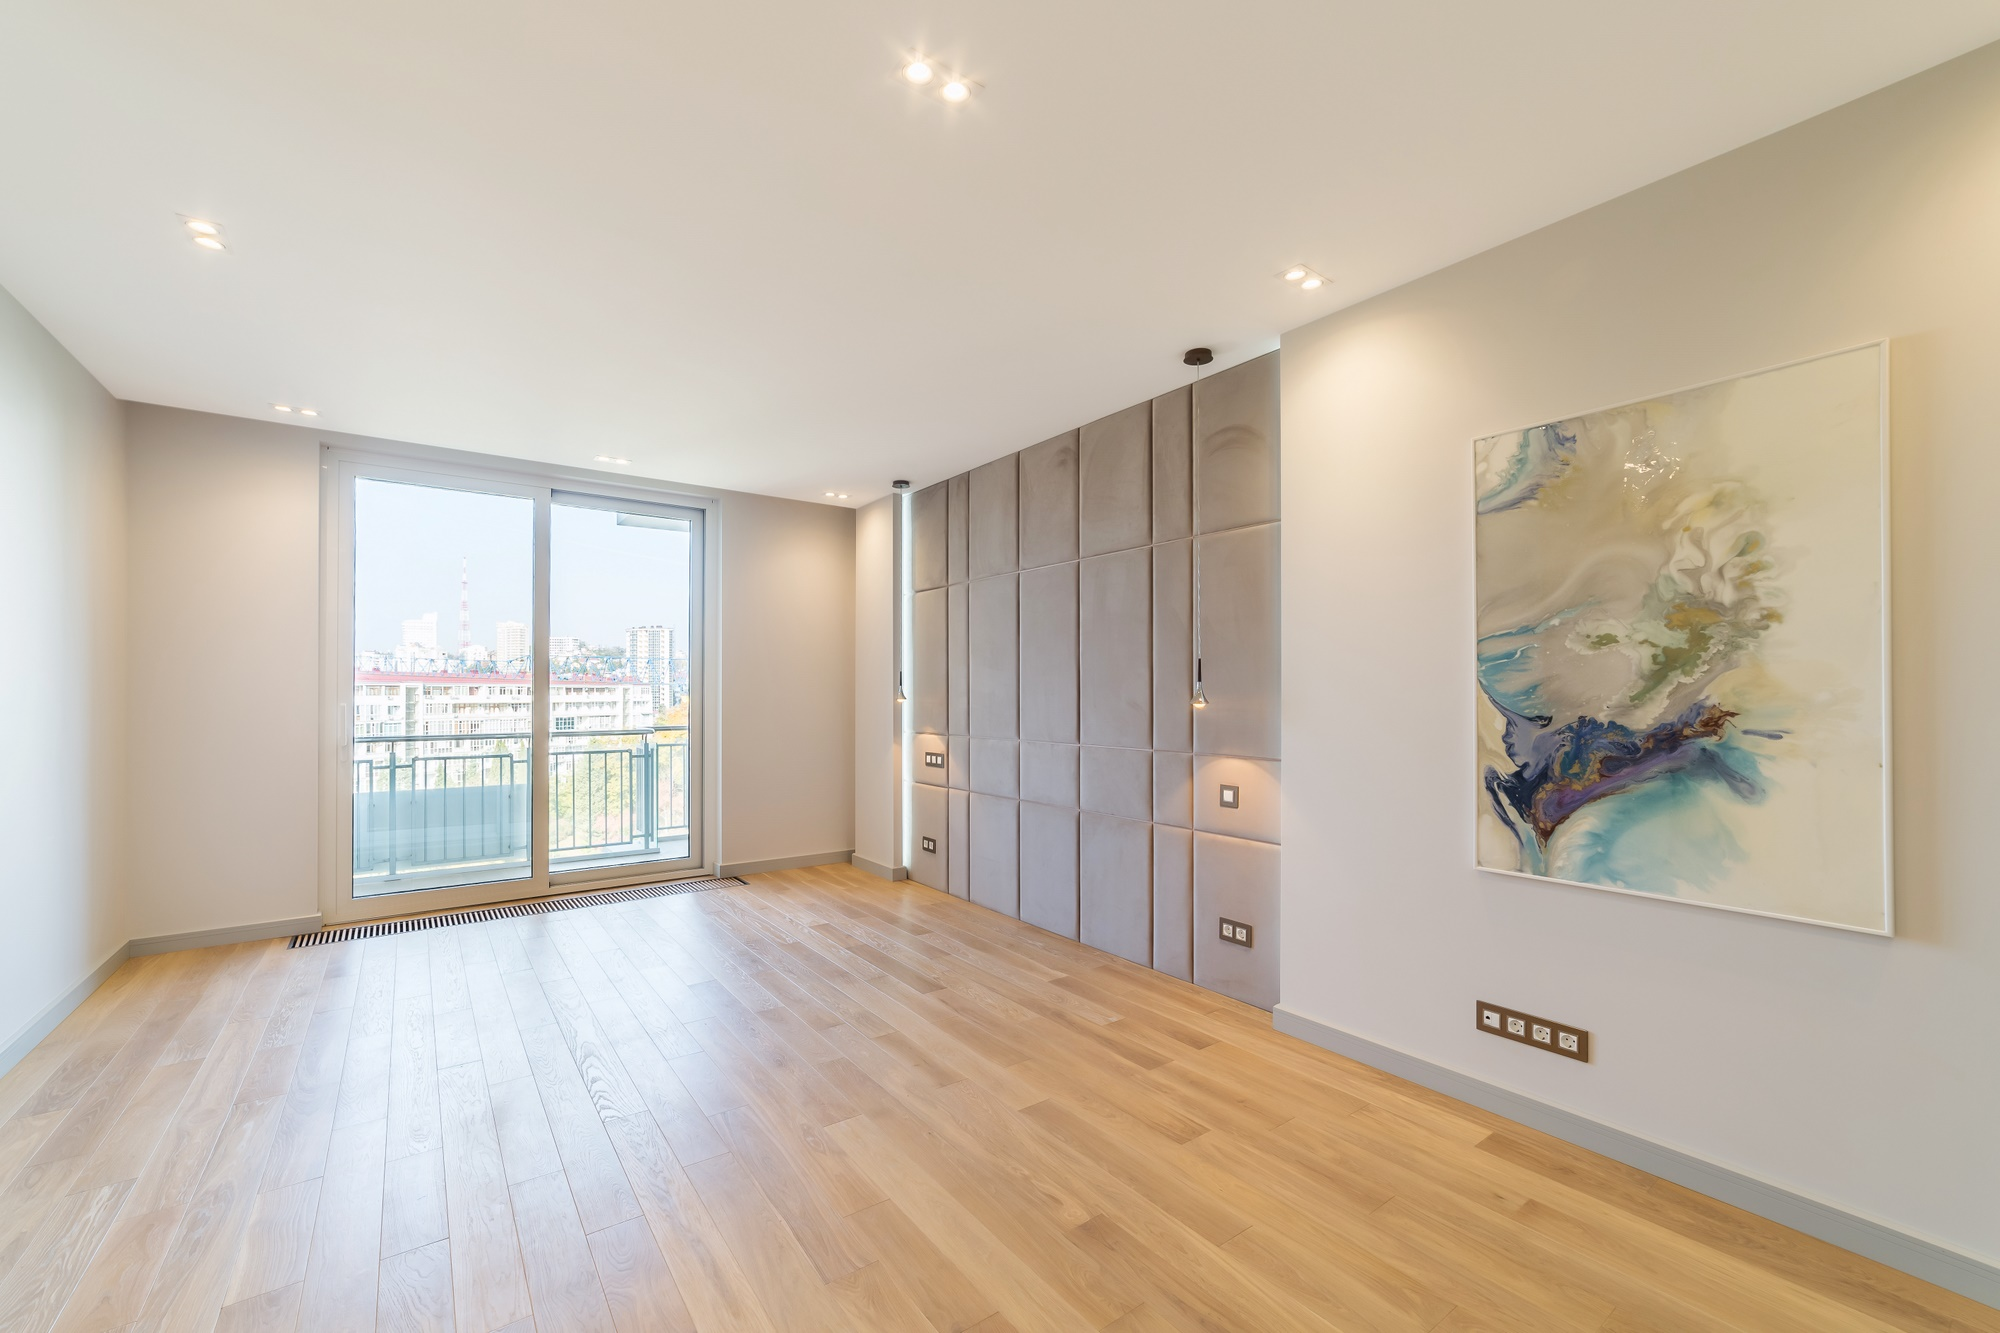 купить квартиру сочи жк Барселона